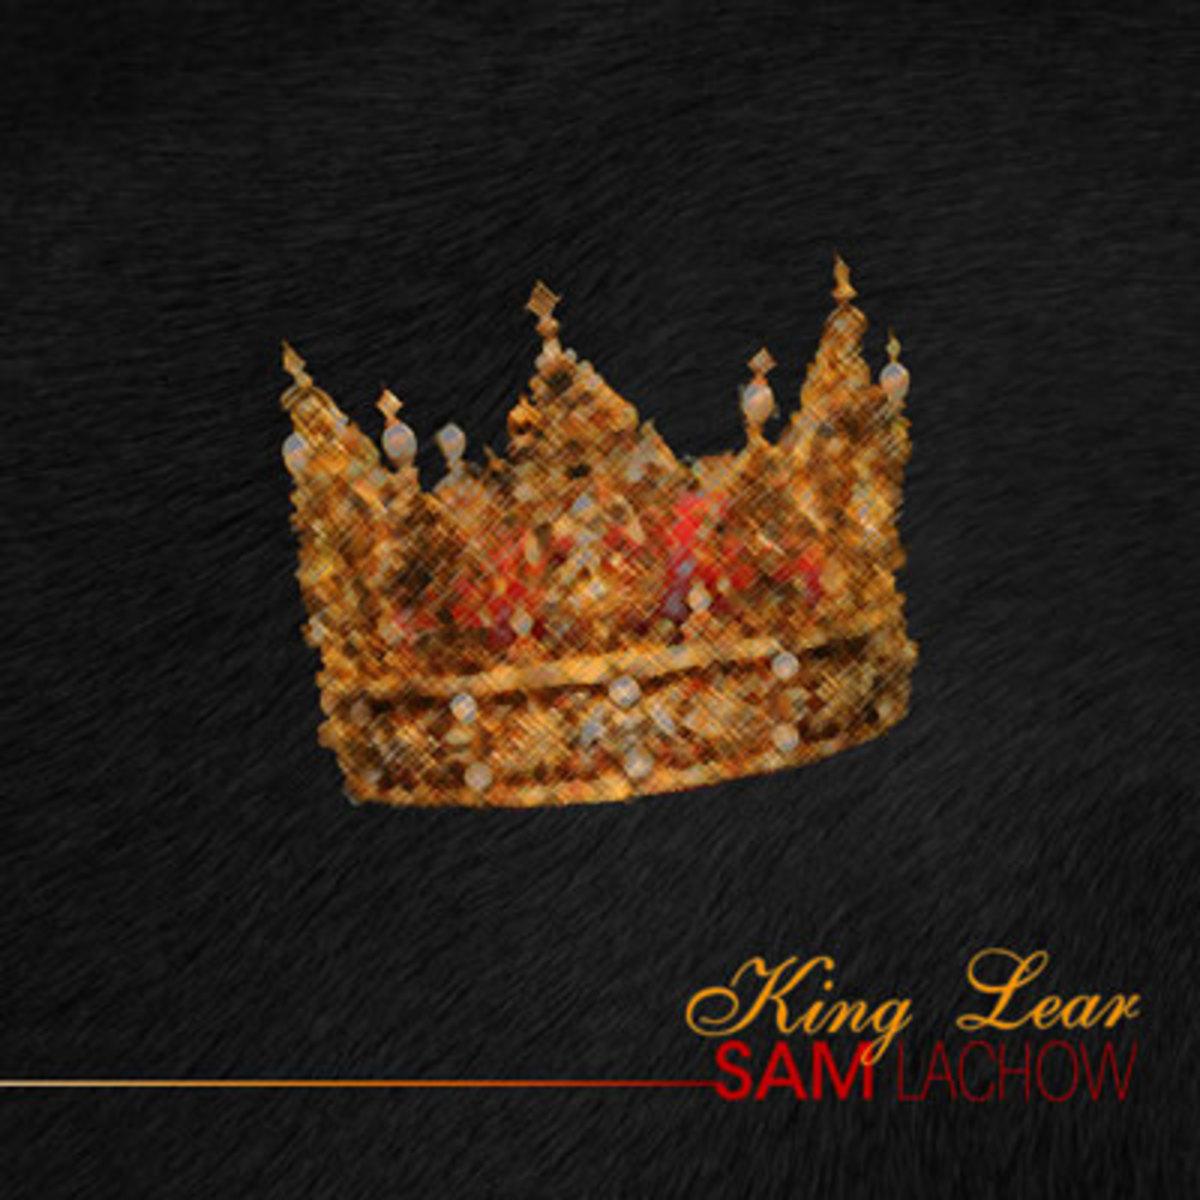 samlachow-kinglear.jpg